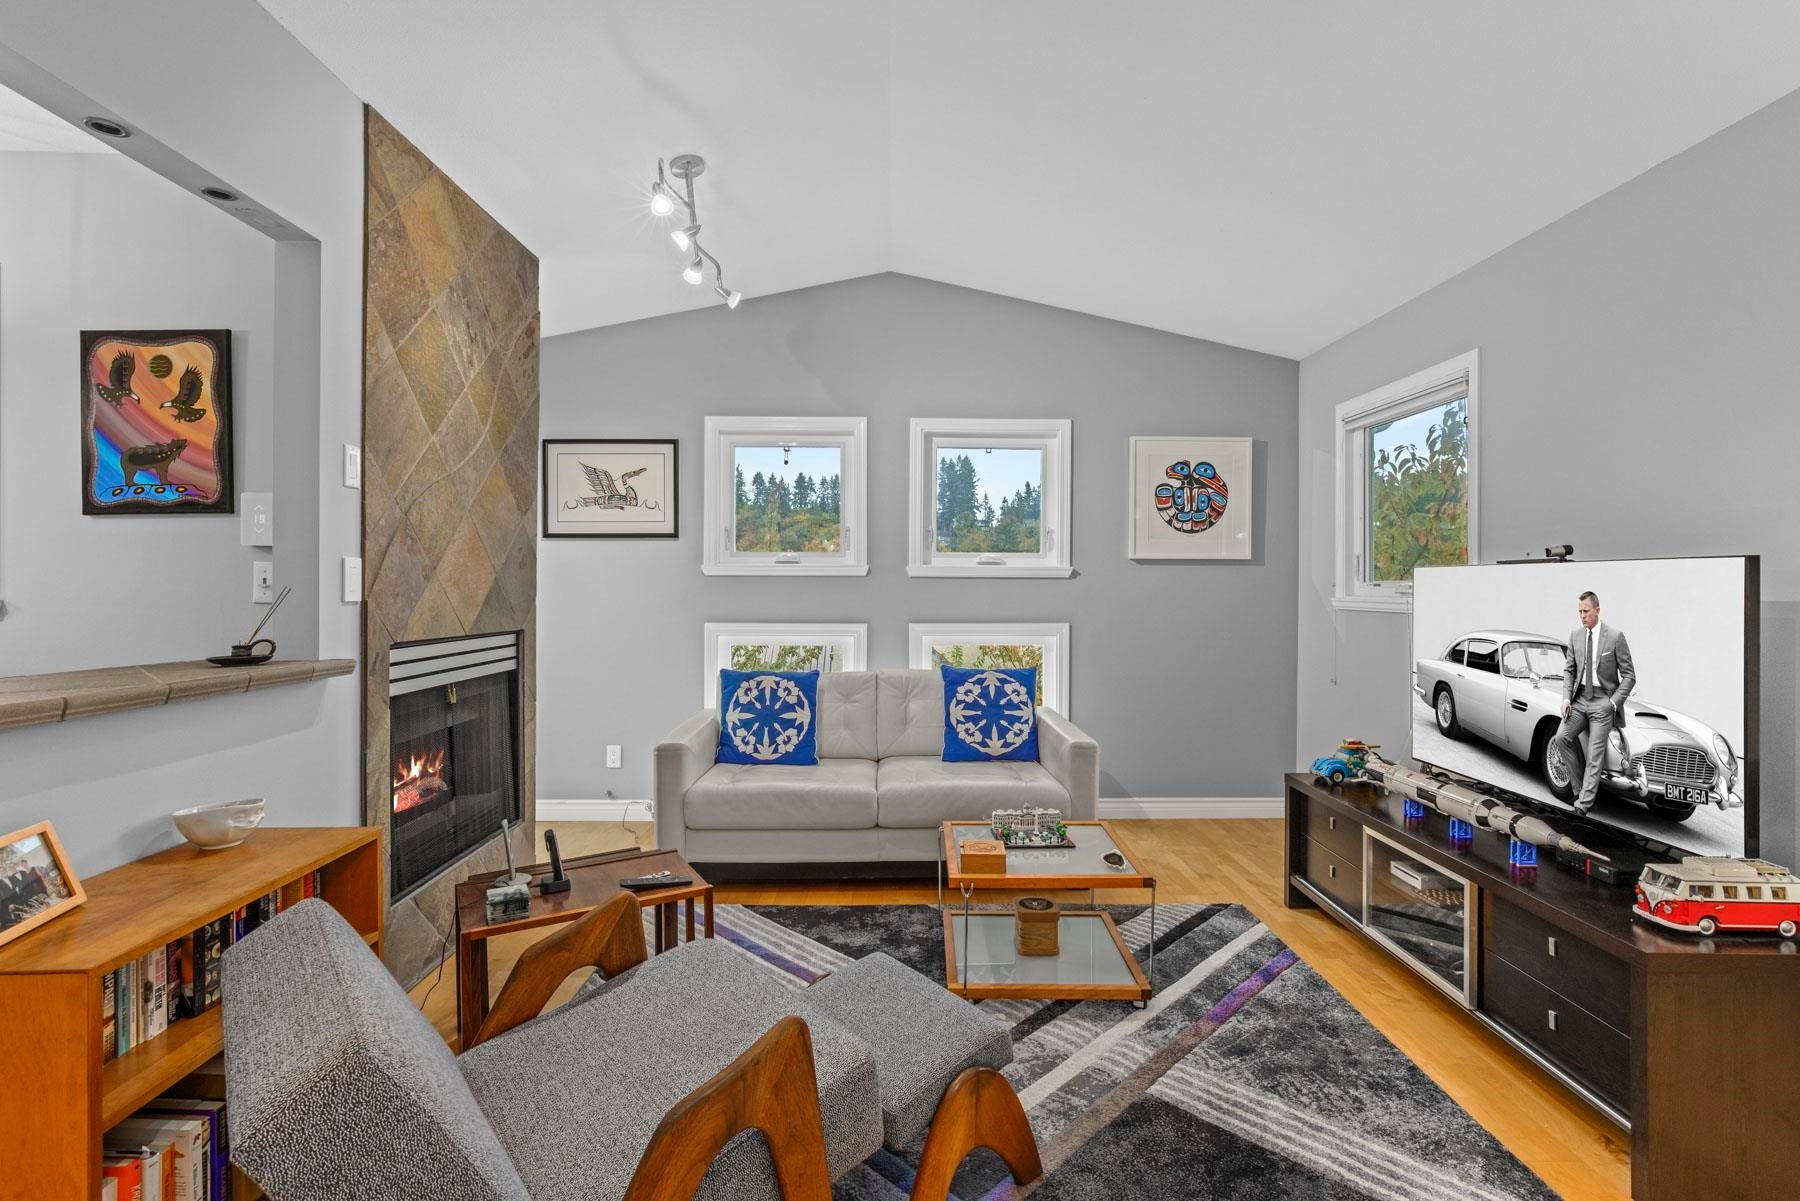 303 1528 BOWSER AVENUE - Norgate Apartment/Condo for sale, 2 Bedrooms (R2626459) - #1